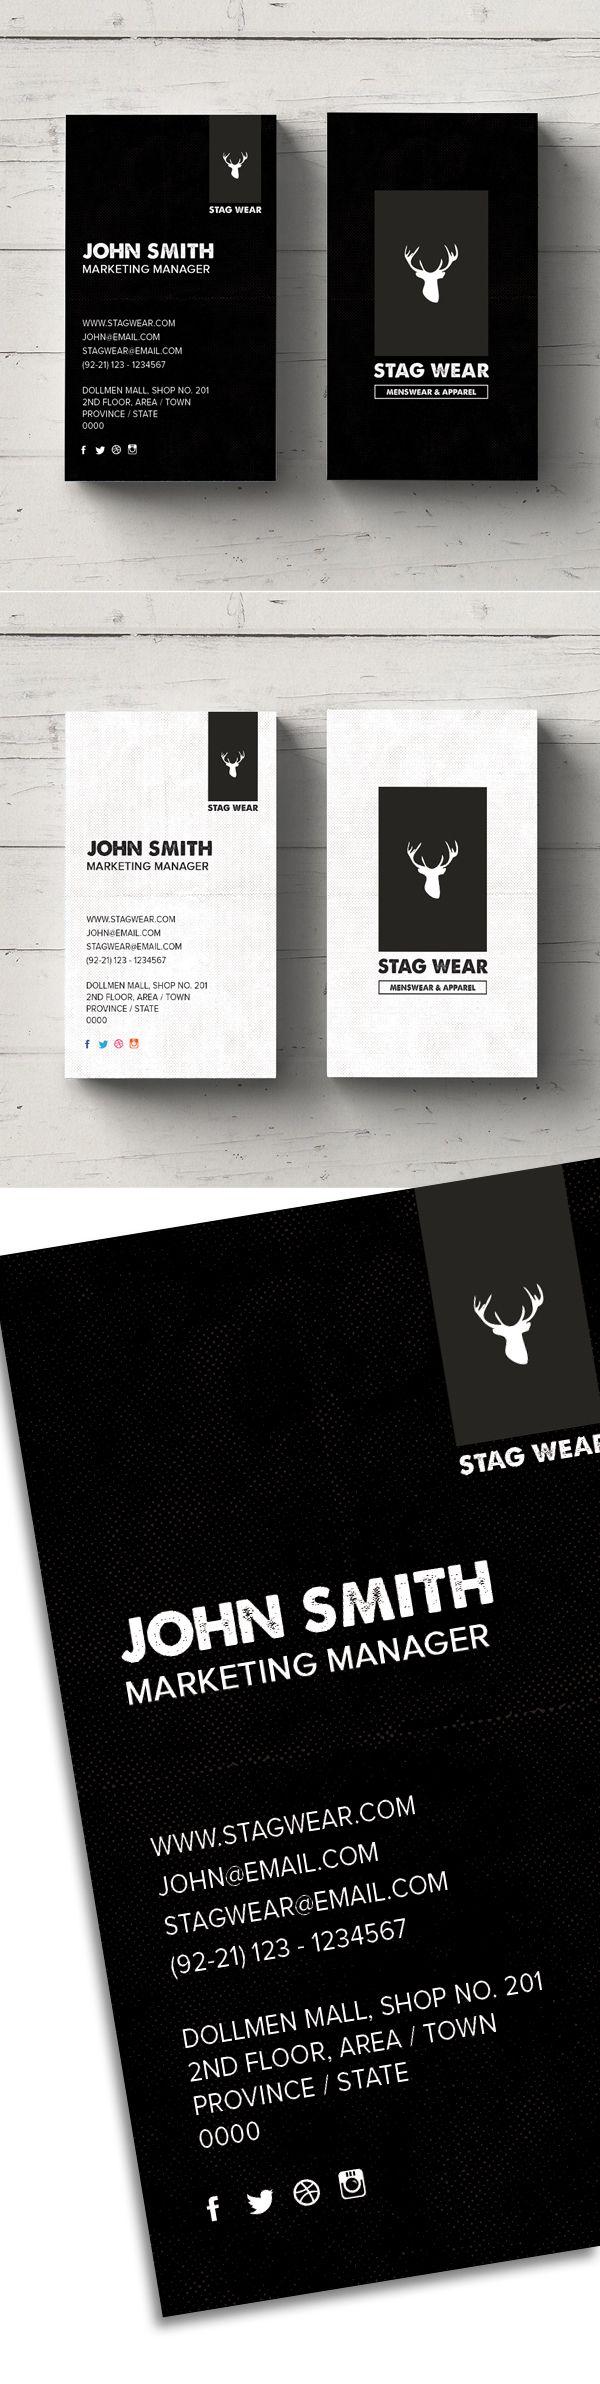 Free Vertical Business Card PSD Template #vertical #black #businesscard #freebusinesscard #freepsdfiles #freebie #minimaldesign #psdtemplate